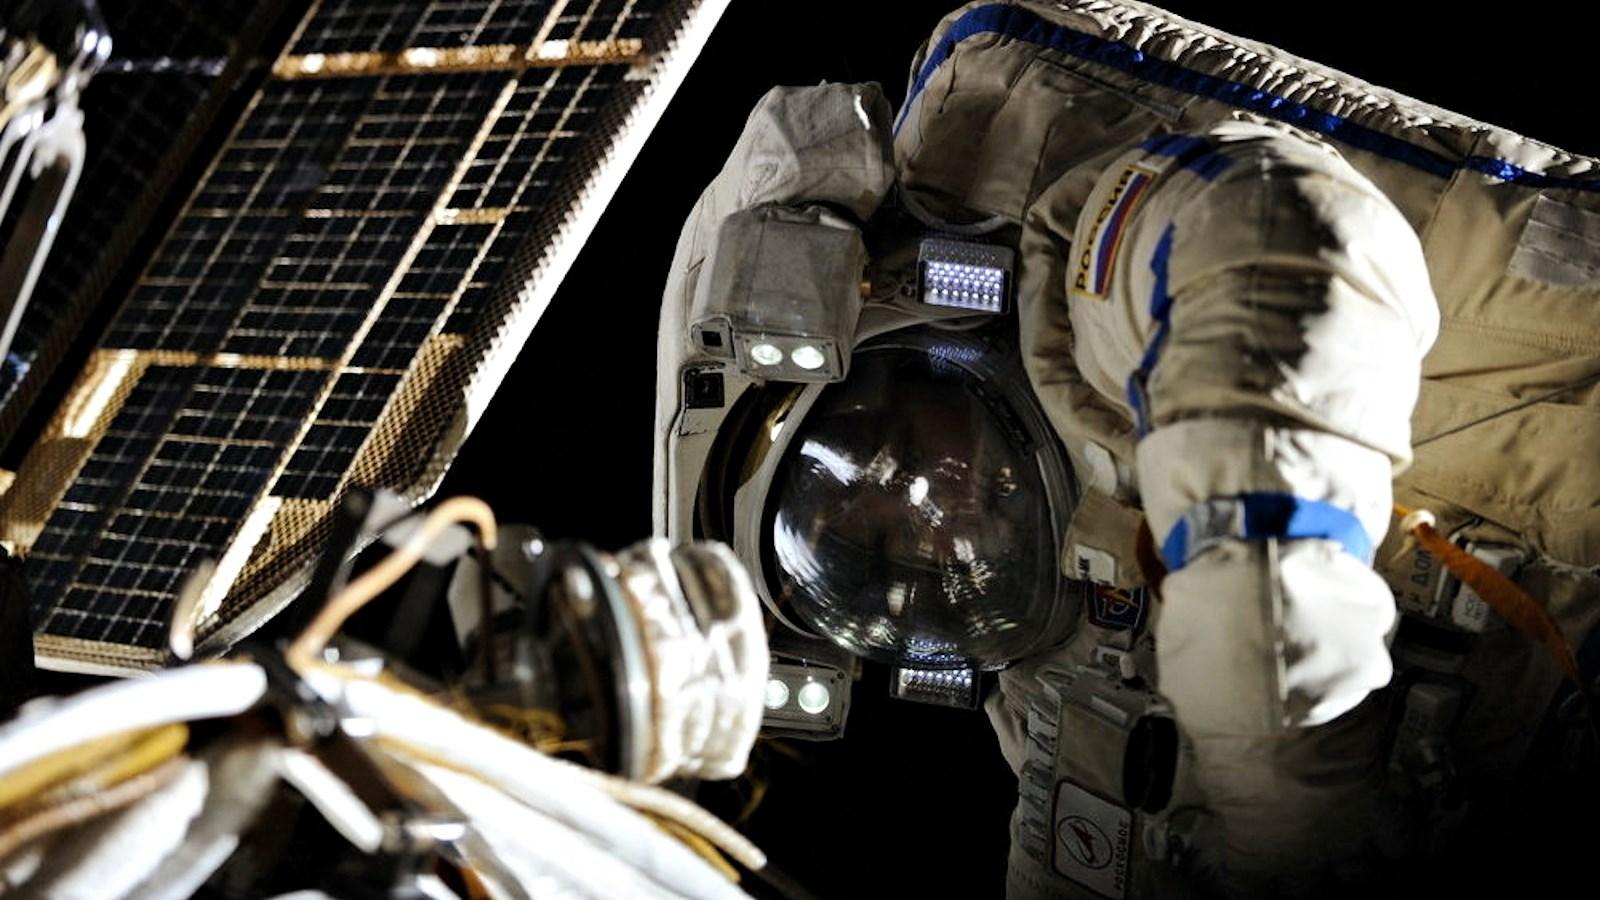 00 russian cosmonaut. 26.03.15